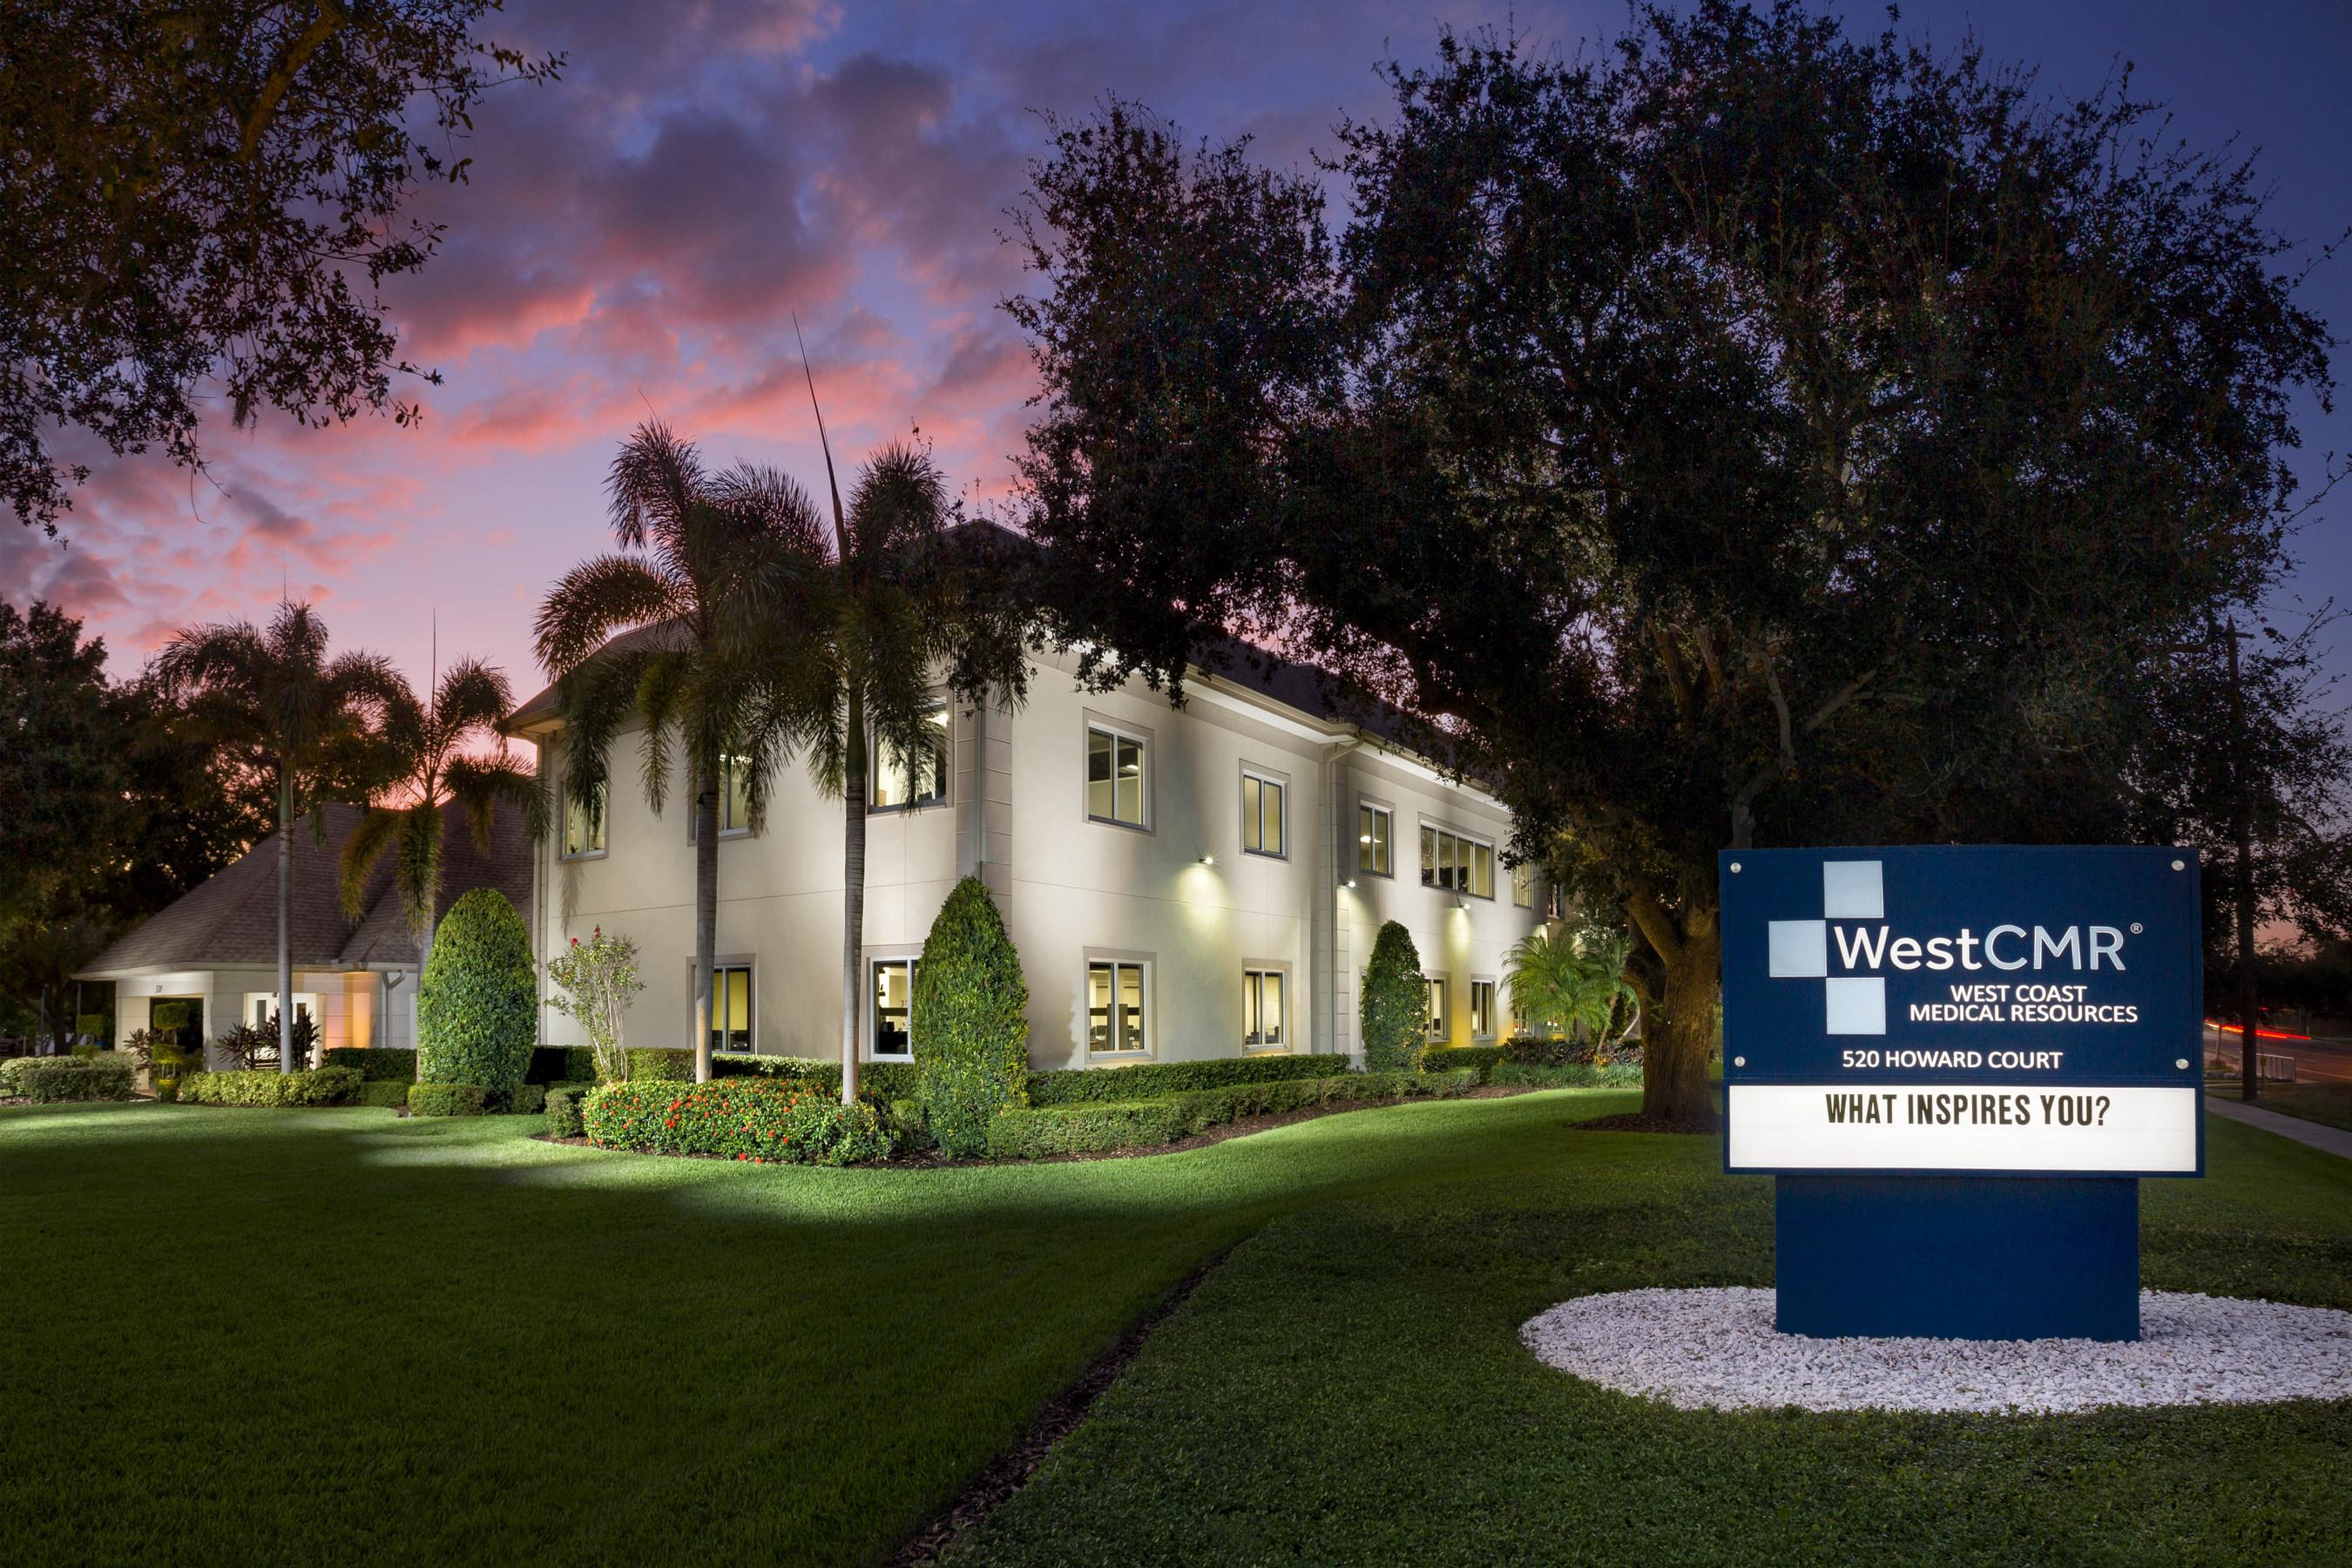 WestCMR Headquarters